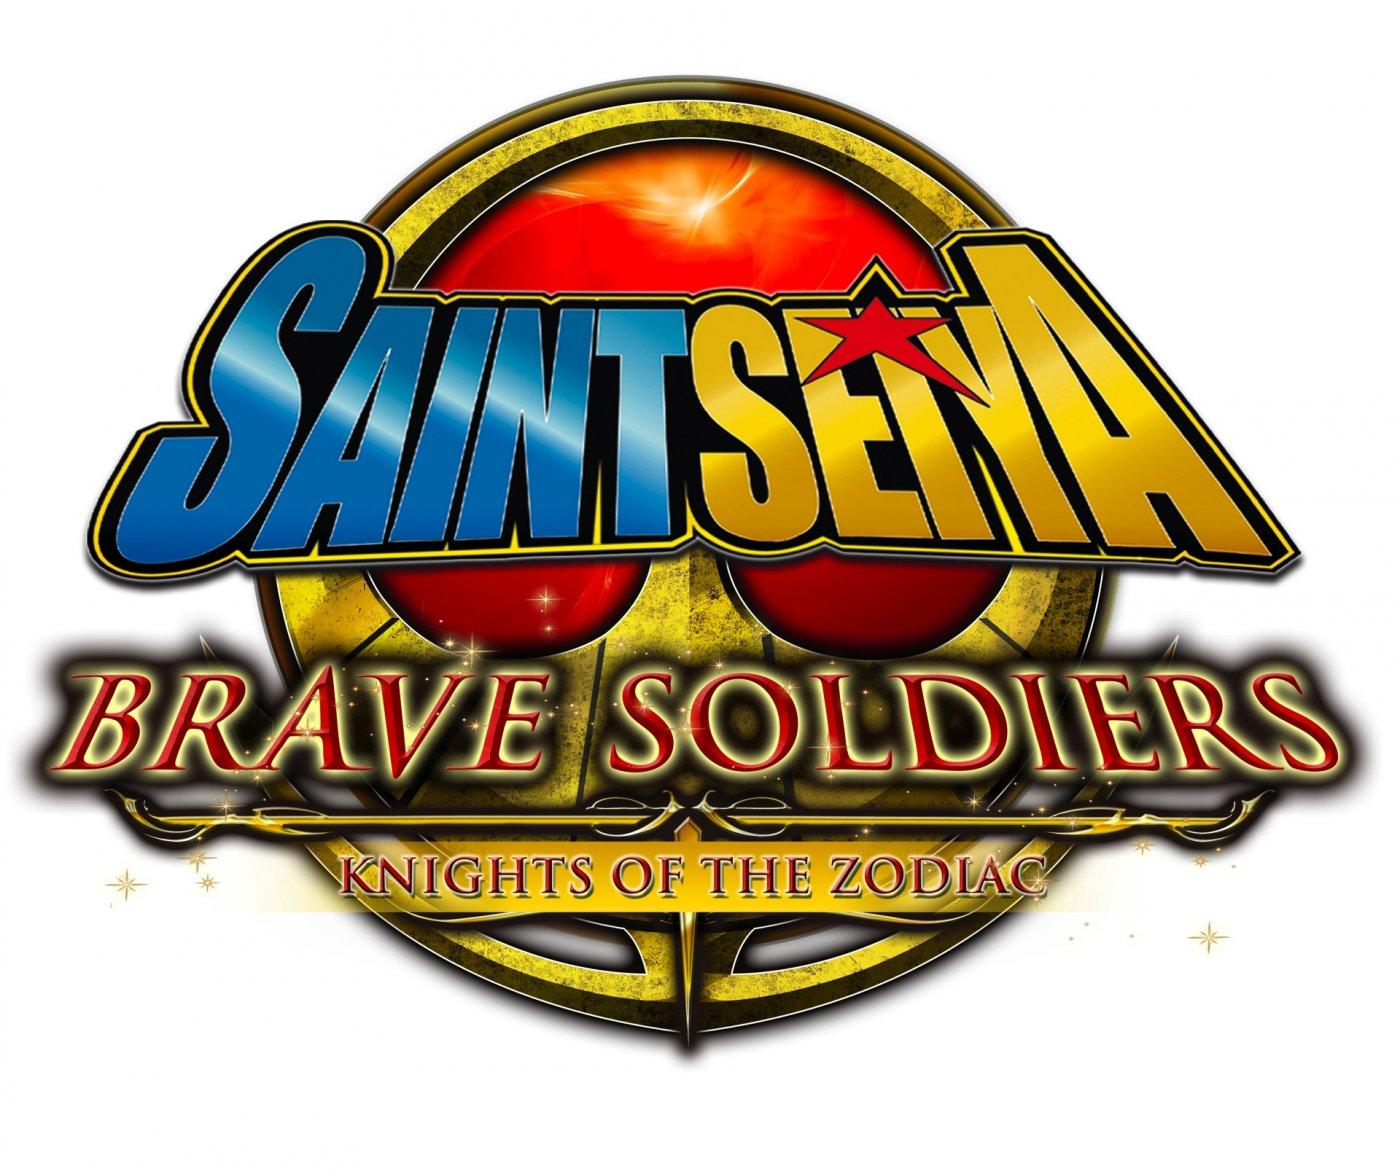 saint_seiya_brave_soldiers-logo